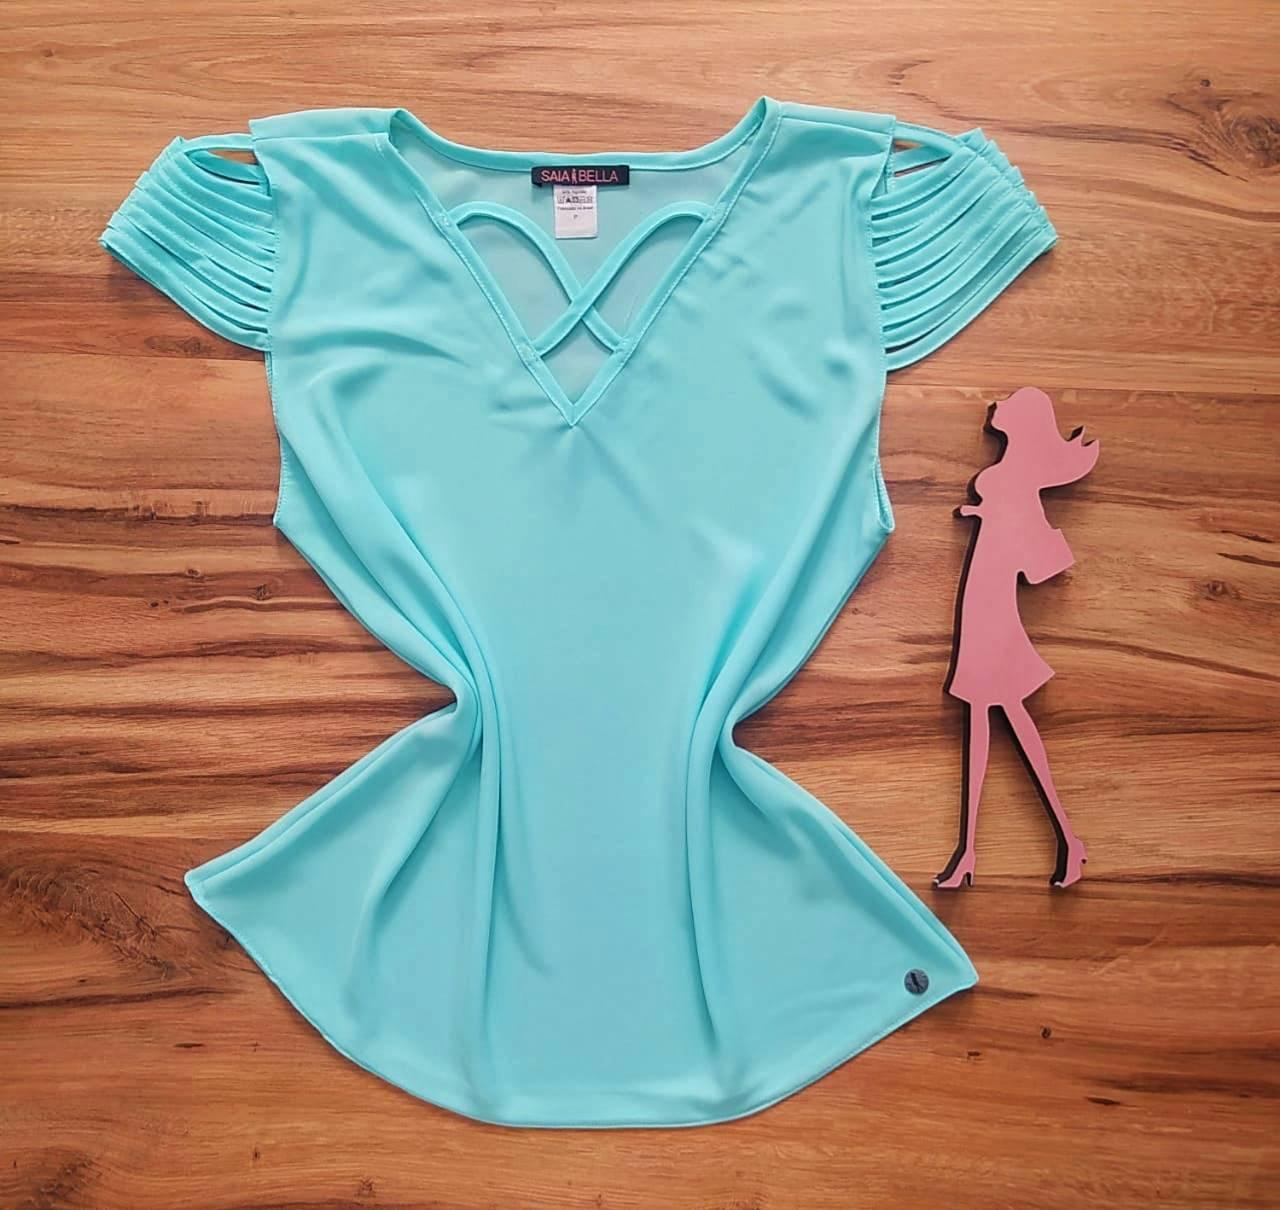 Blusa Sheila Saia Bella - SB8018804. azul céu